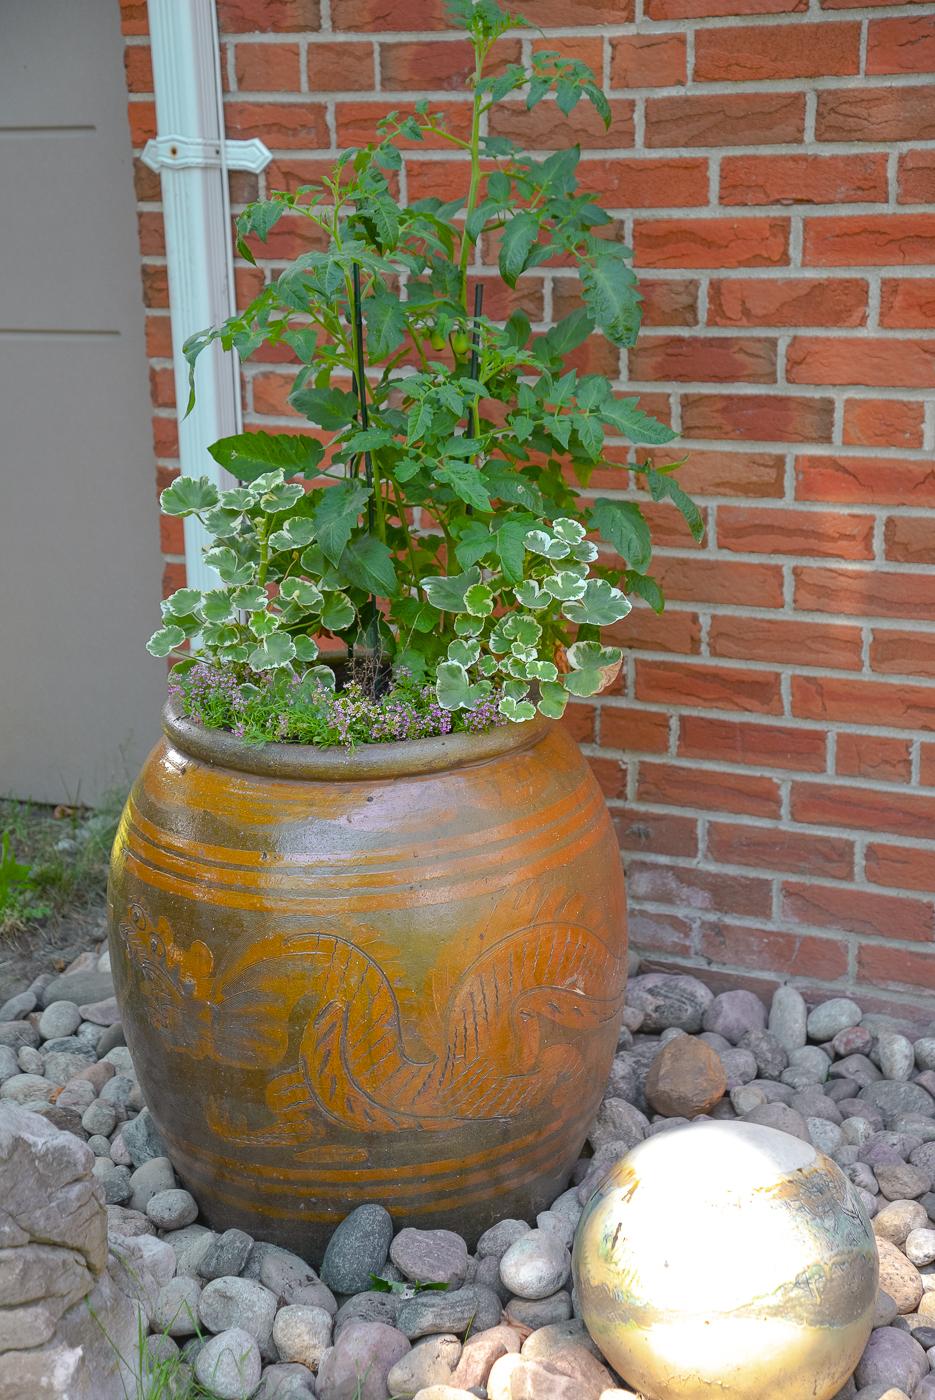 tomato plant in planter, tomato plant and geraniums, tomato plant urn